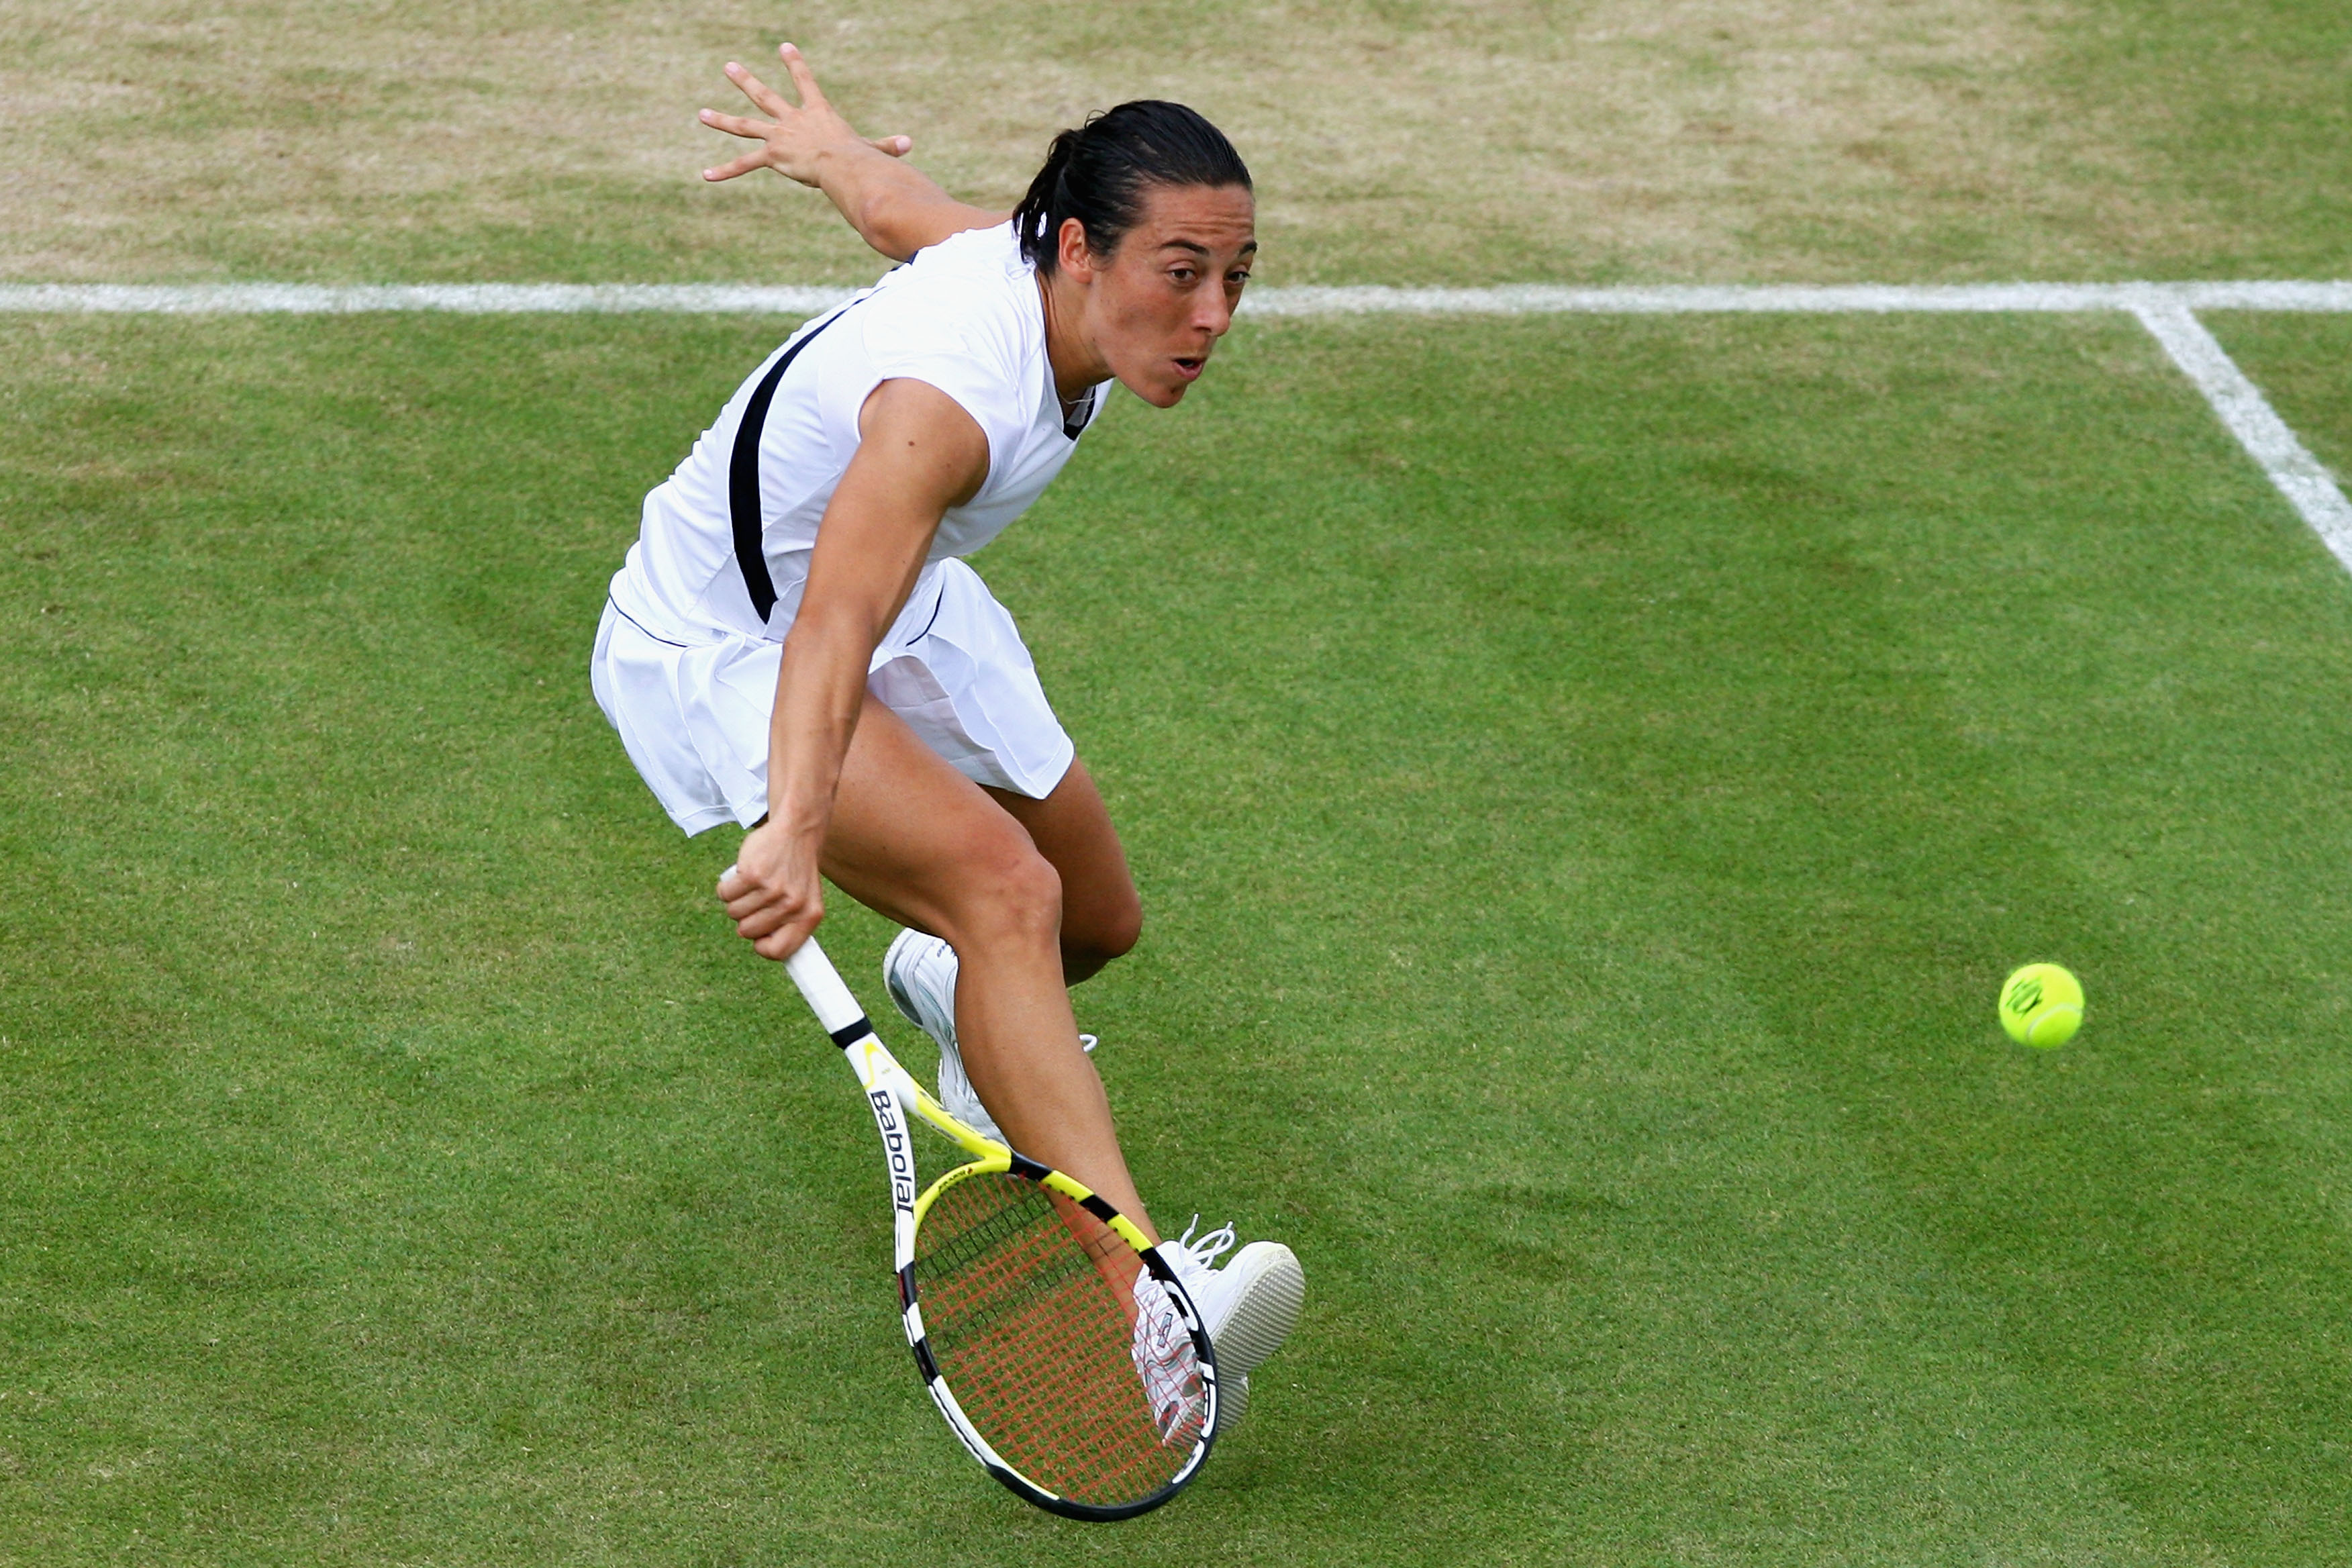 Francesca Schiavone at Wimbledon in 2009.